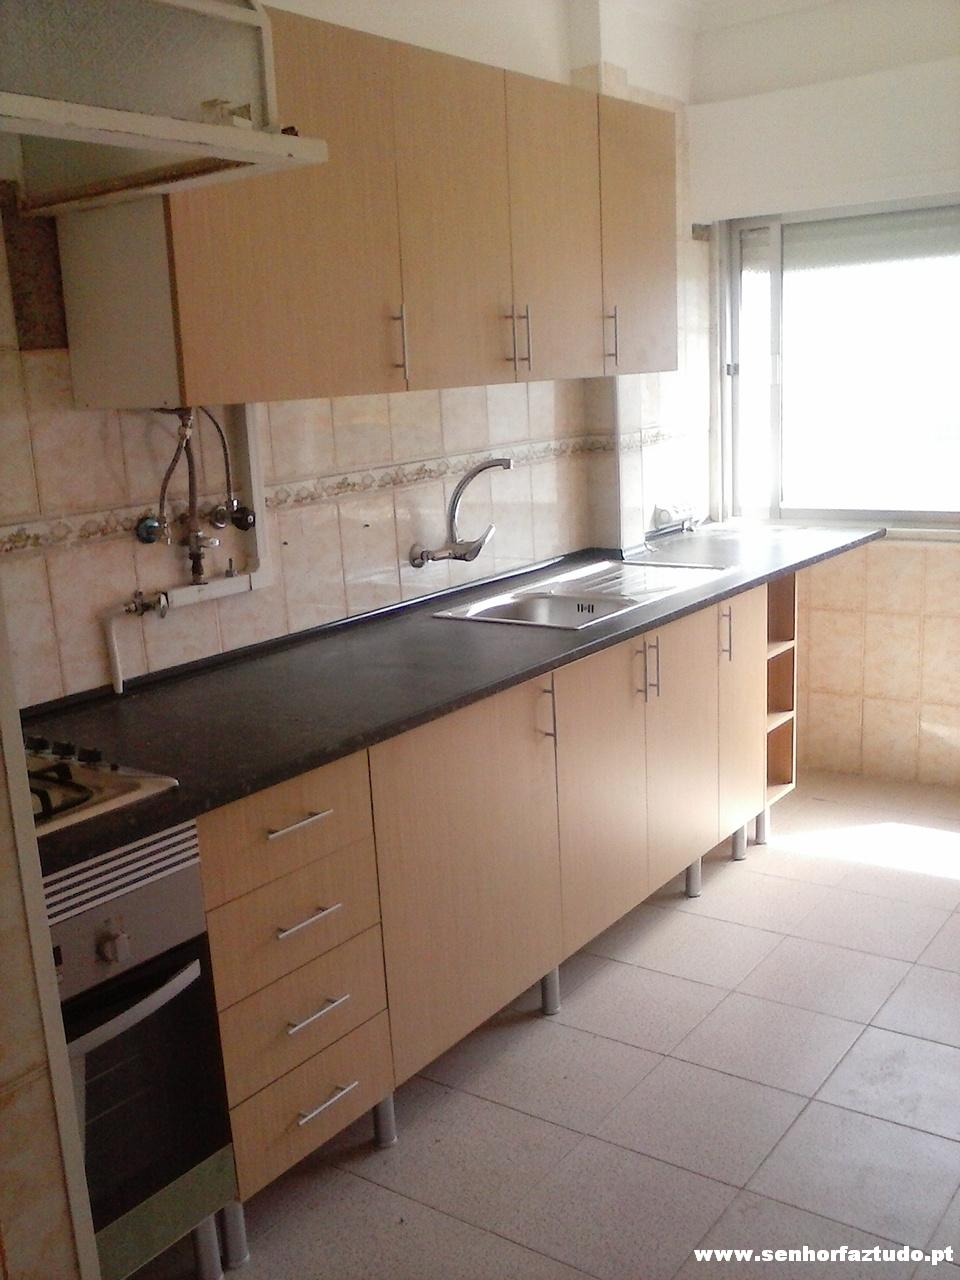 Portas armarios cozinha leroy merlin id ias - Armarios modulares leroy merlin ...